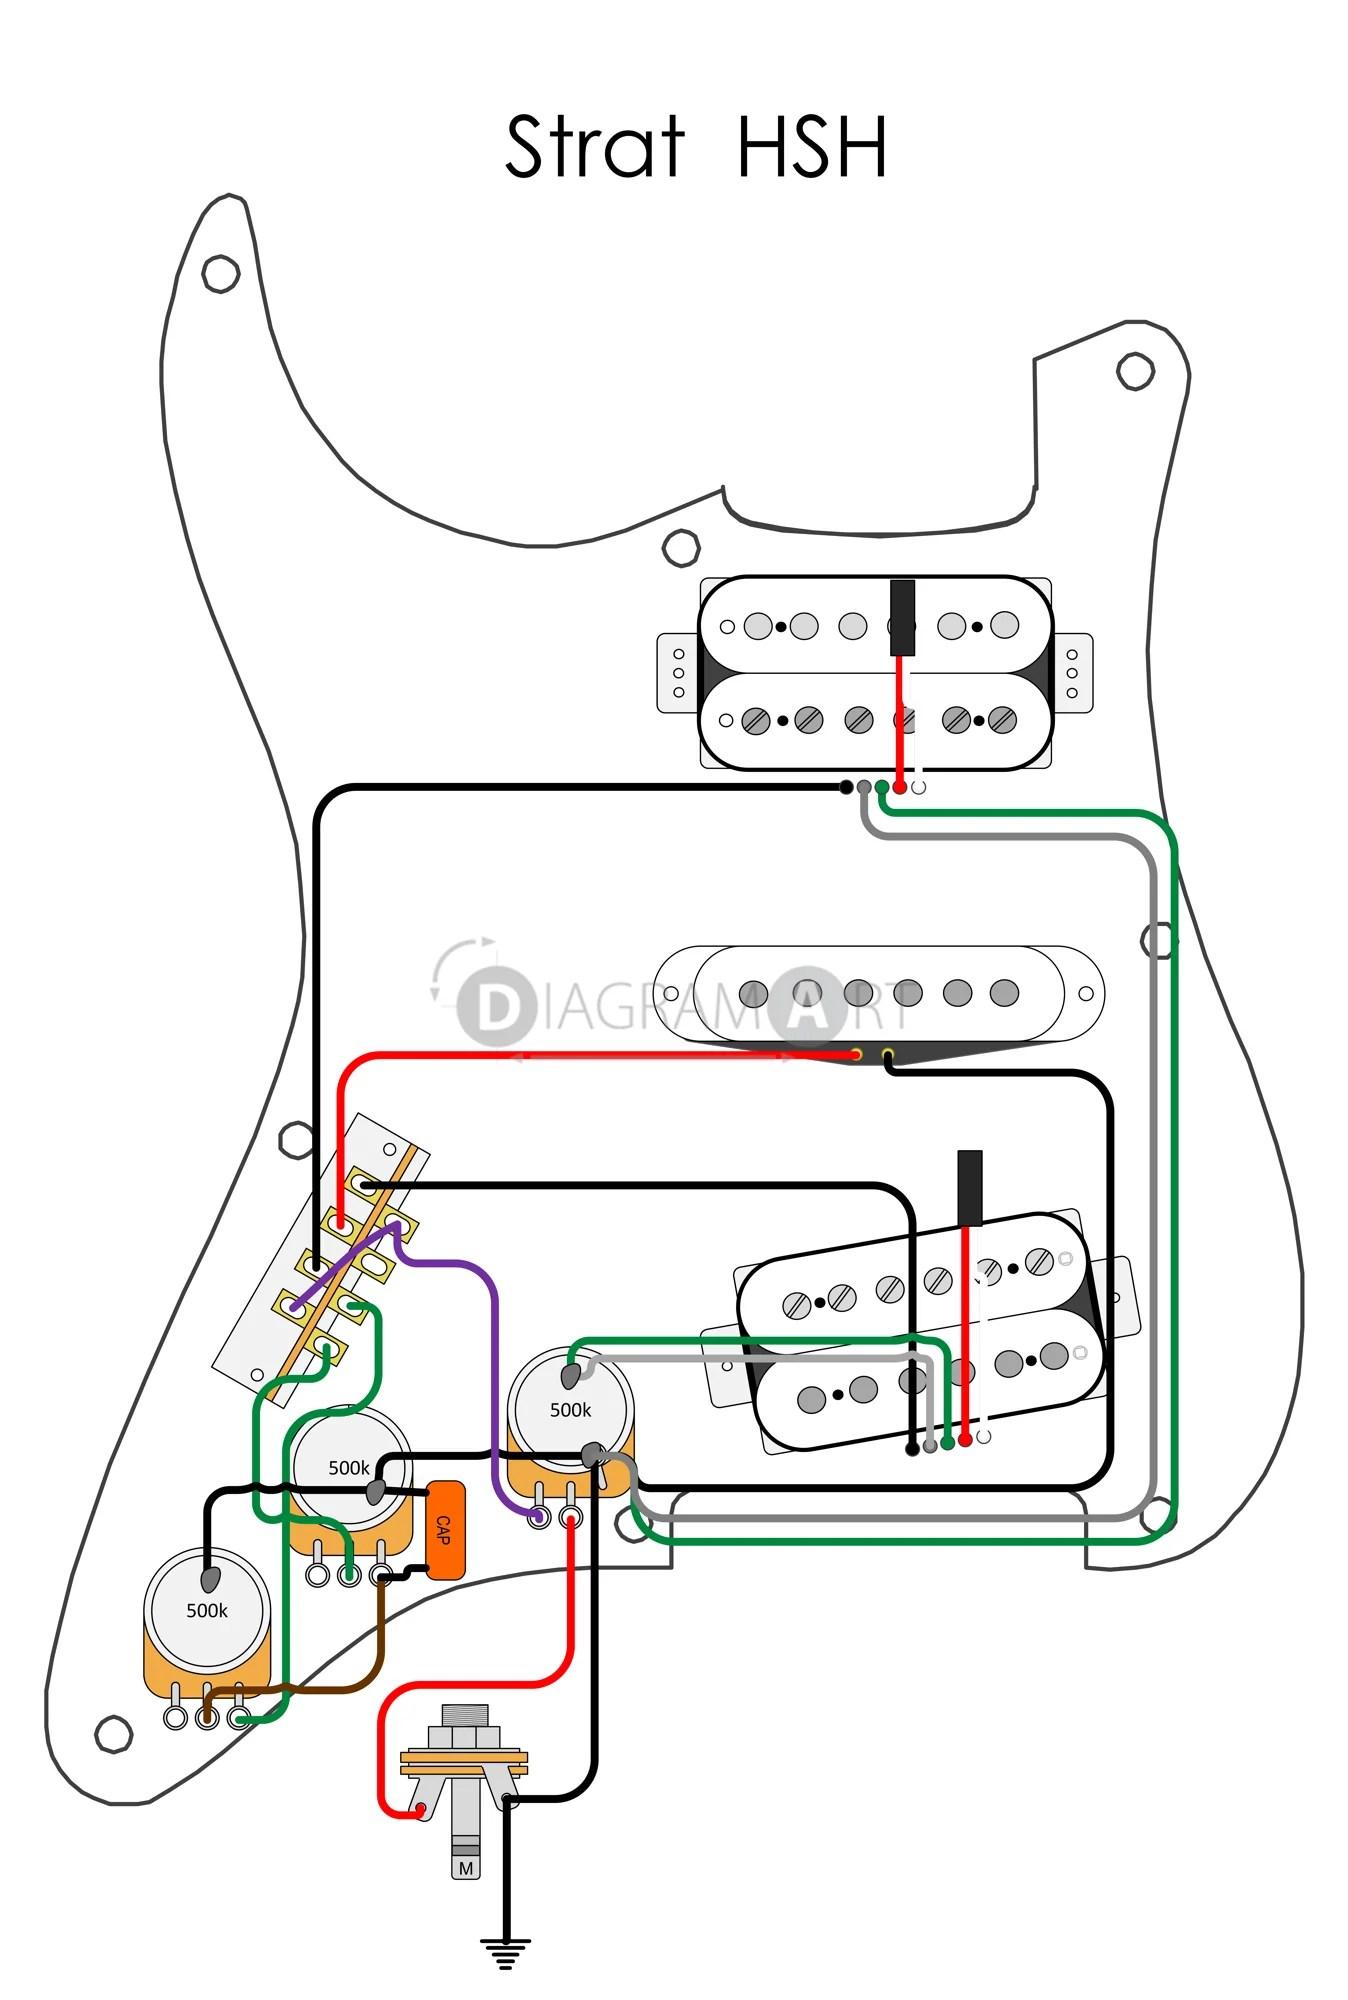 small resolution of free download guitar wiring diagrams diagram jem simple wiring schema friendship bracelet diagrams hs wiring diagram